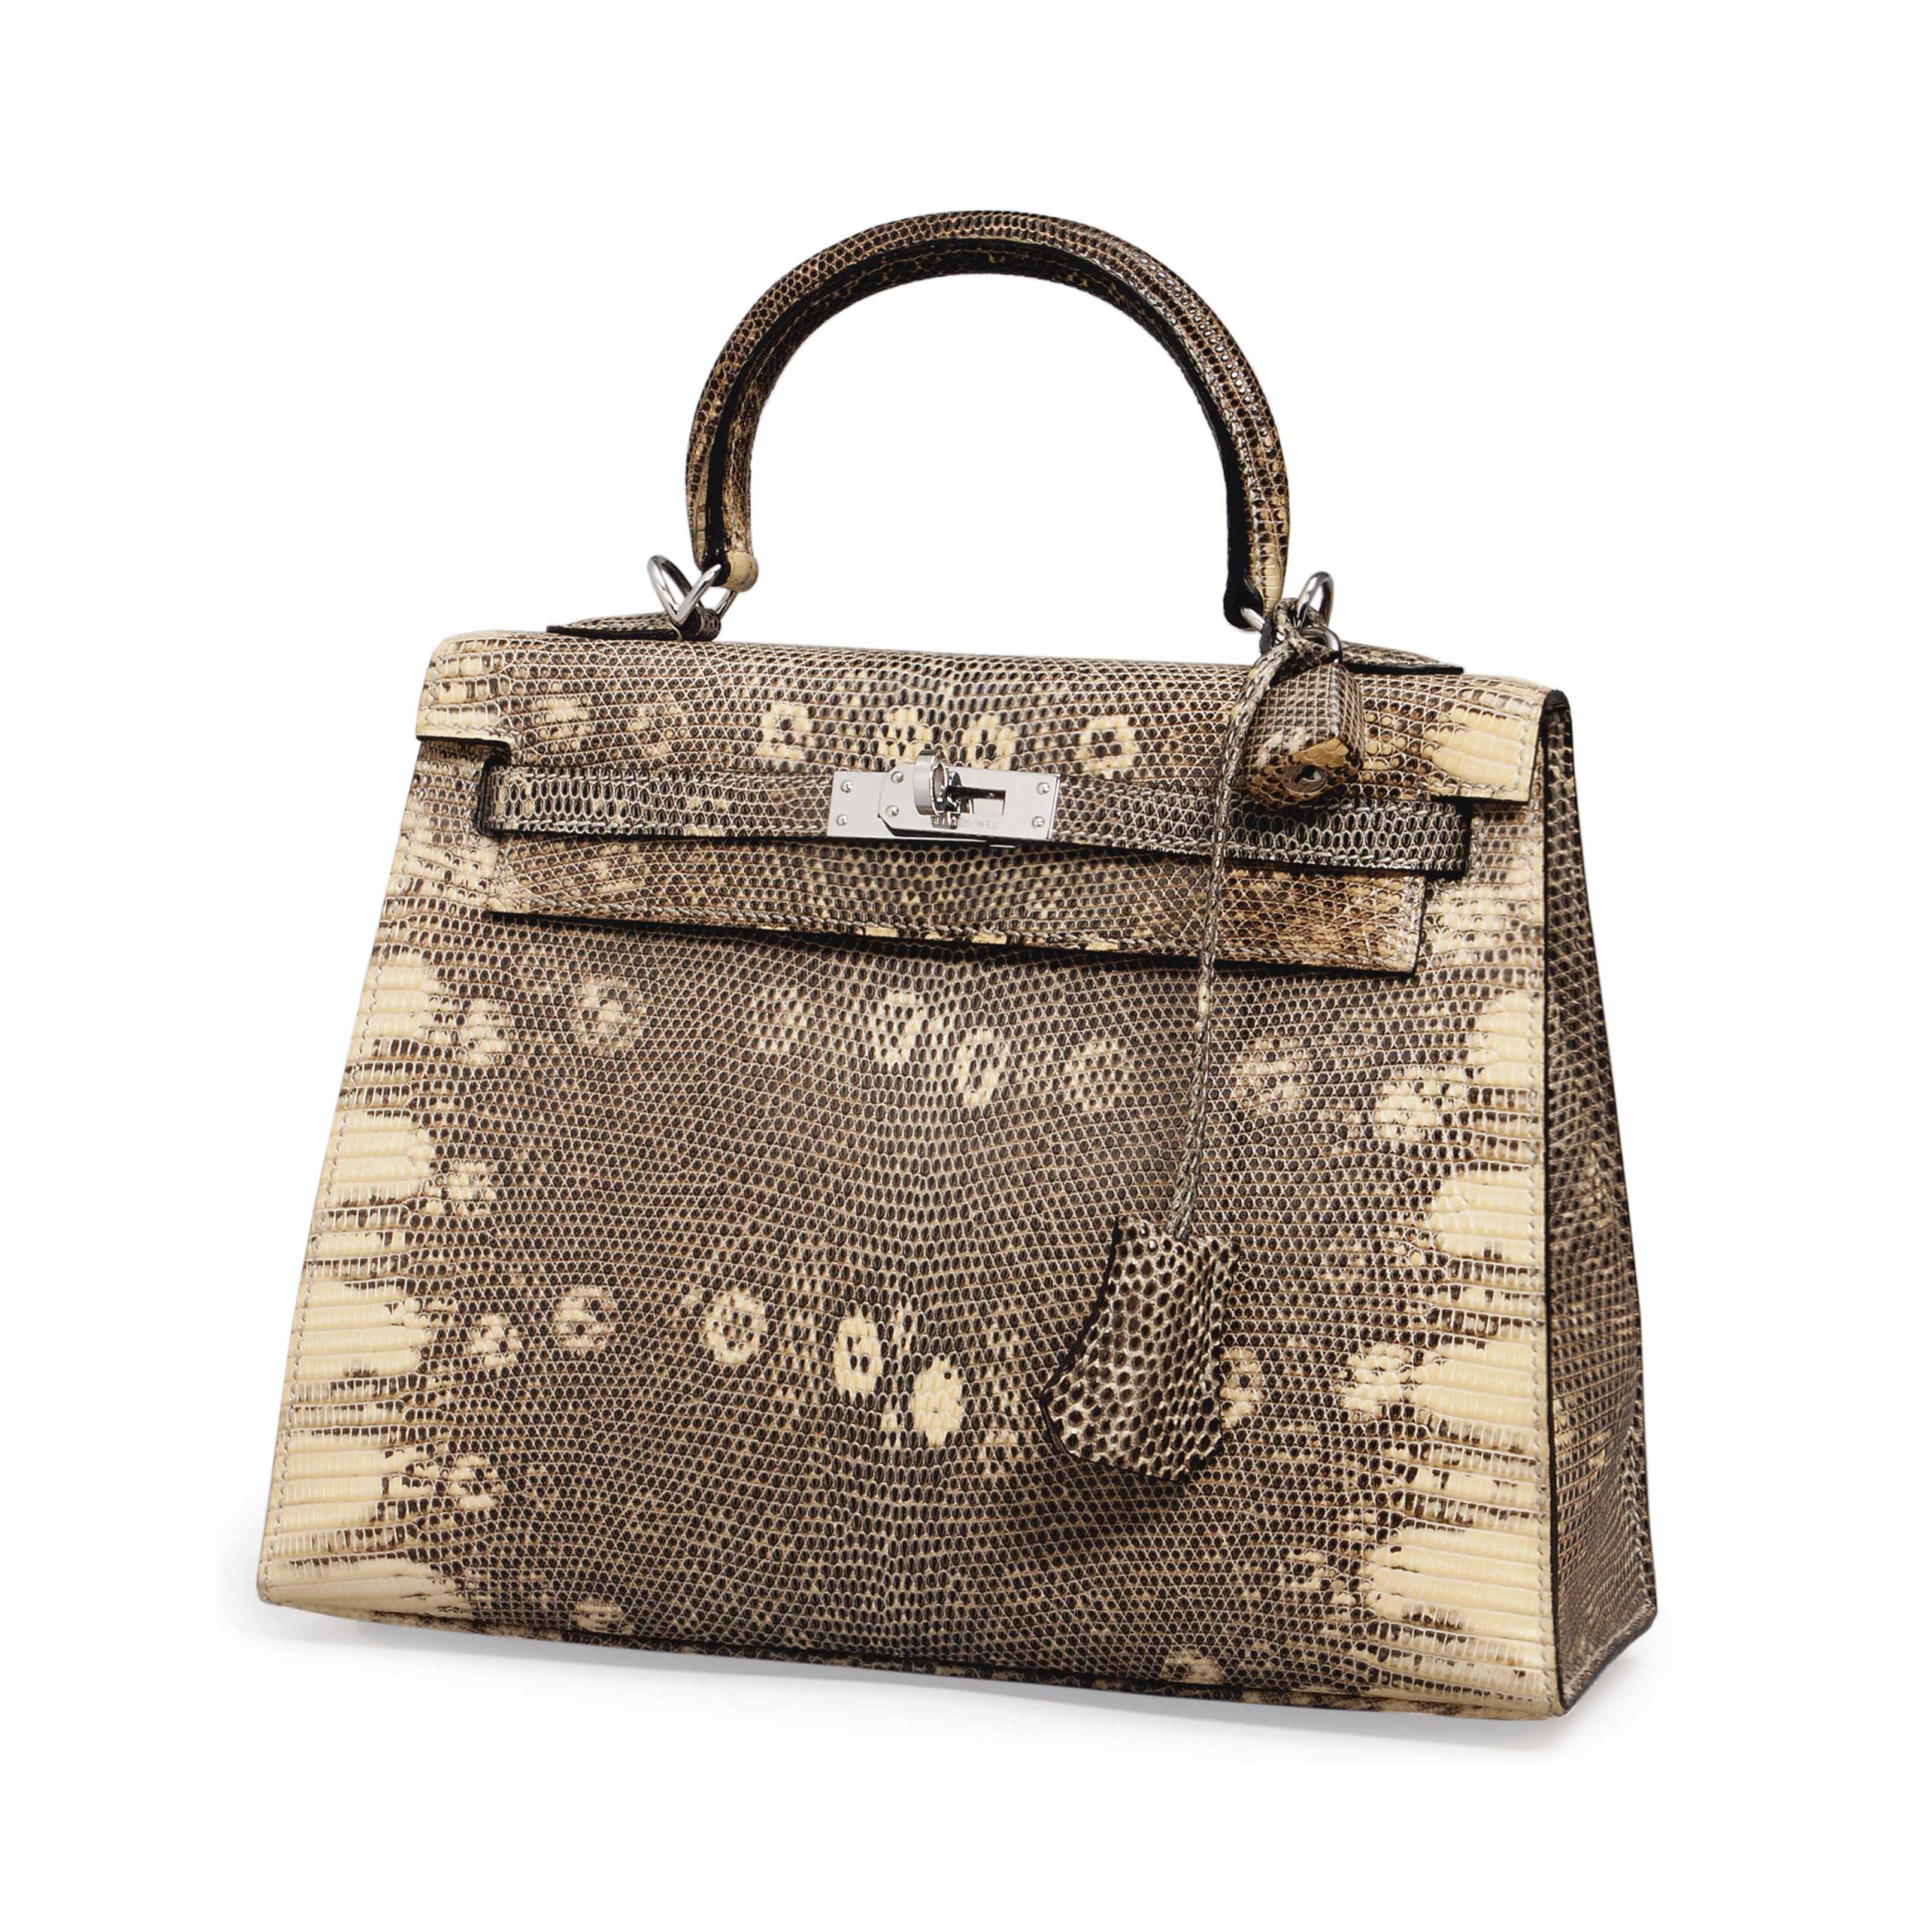 0d200a5b4c ... discount code for an ombre lizard kelly bag hermÈs 2007 21st century  bags 98bef 76d72 wholesale hermes ...